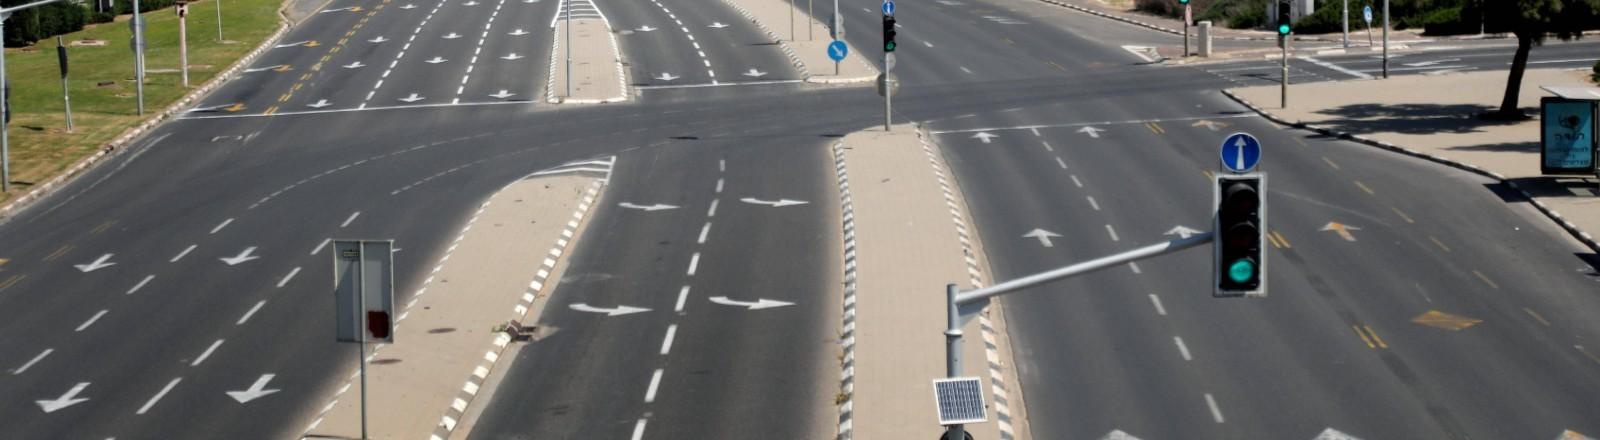 Leere Straße während des Lockdowns im April 2020 in Tel Aviv